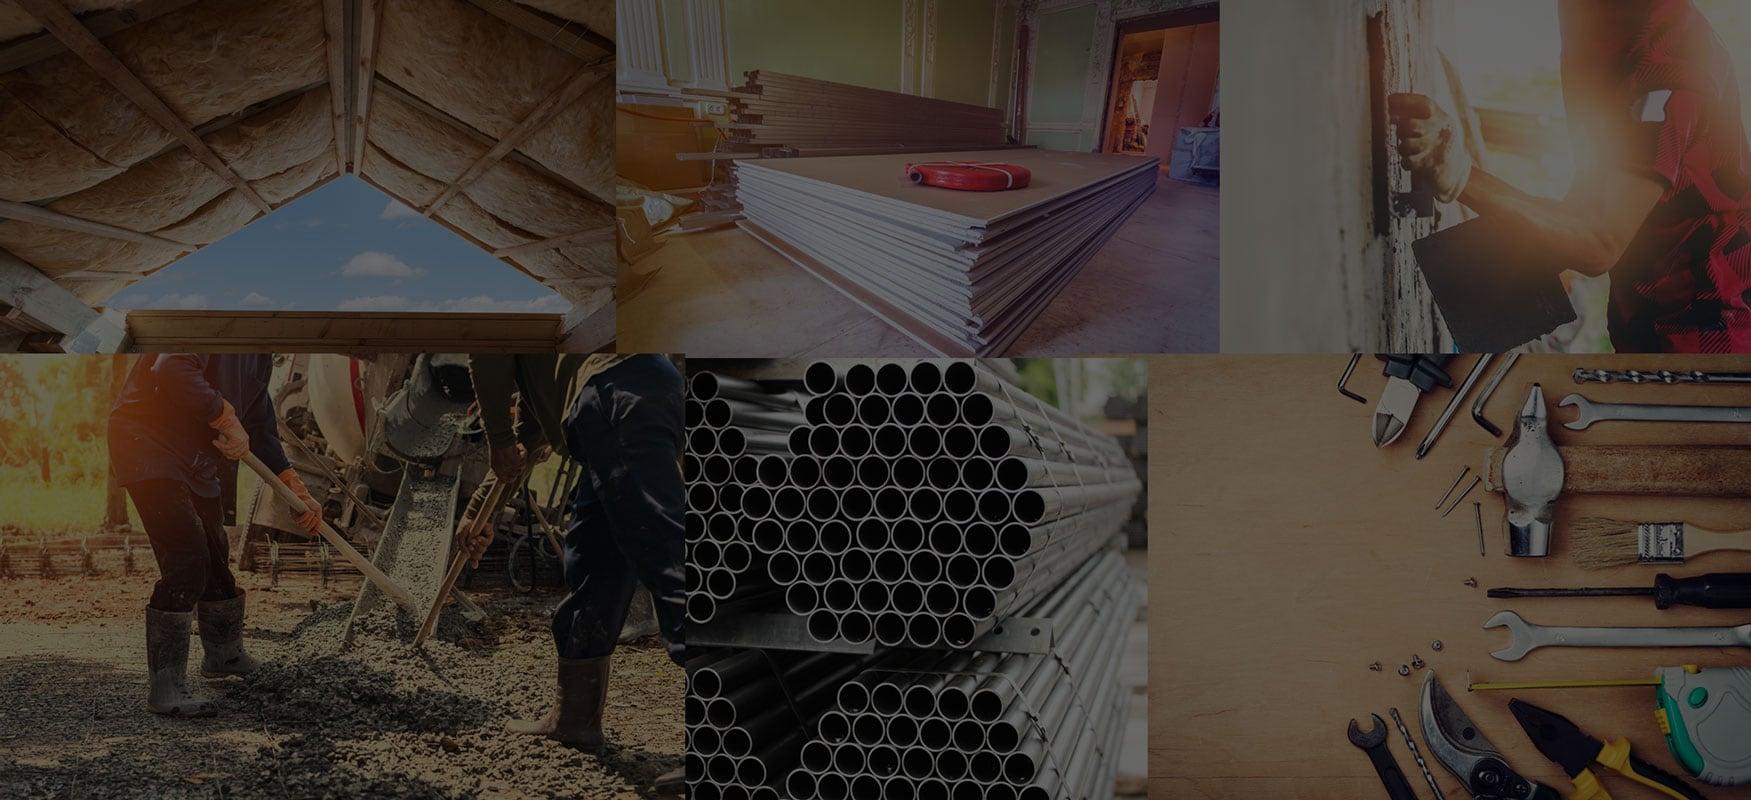 Home - Bernardi Building Supply - Service Built Our Business